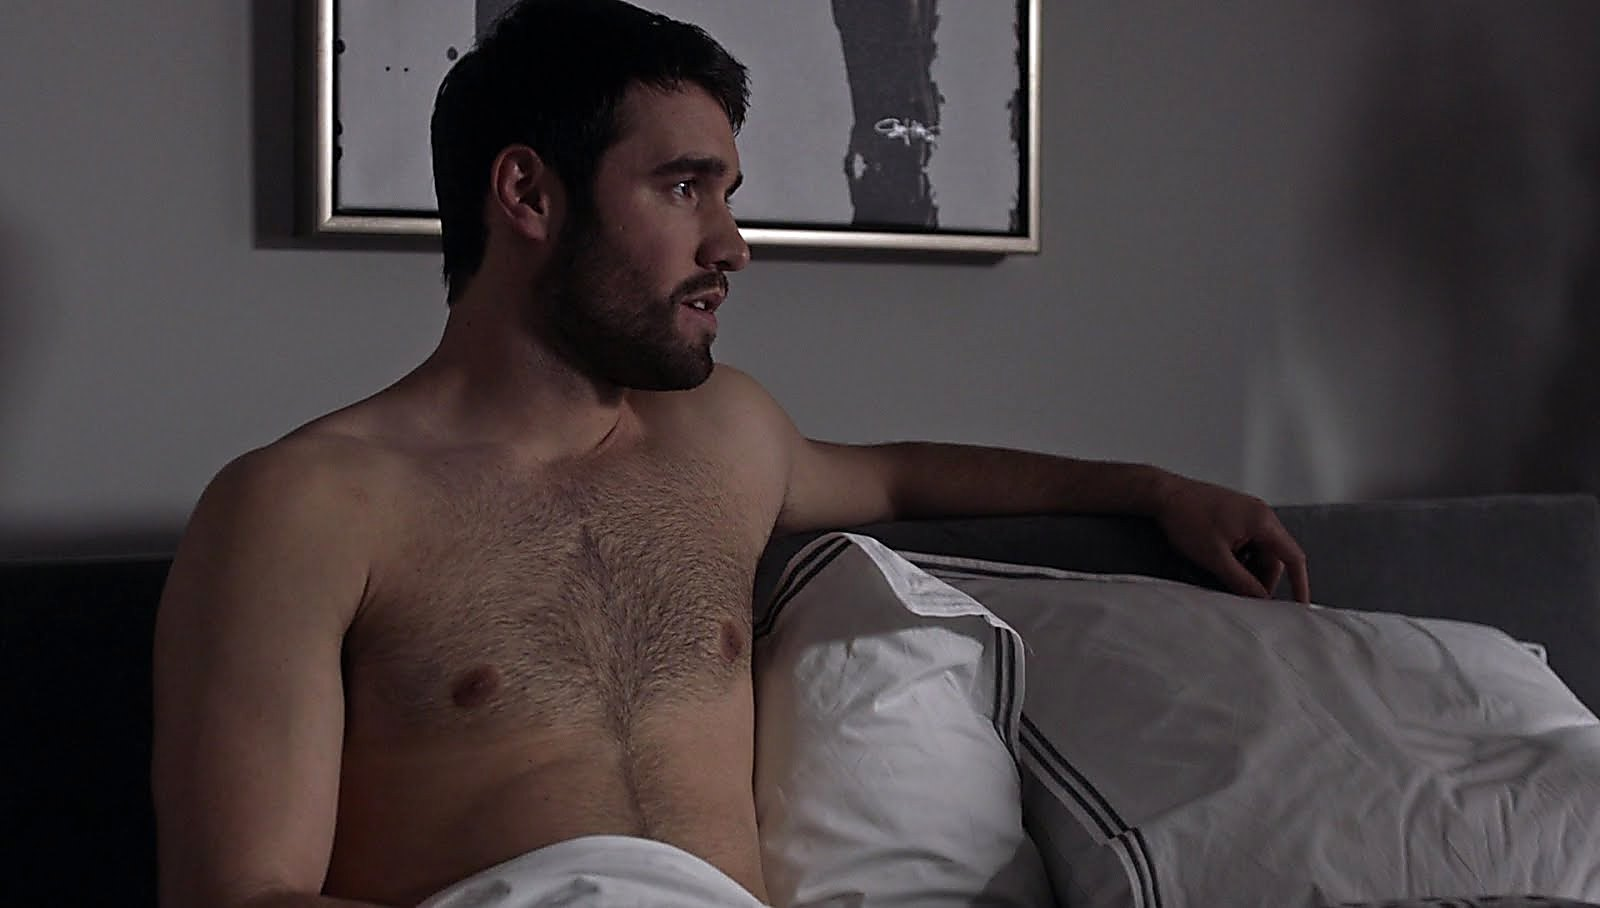 Joshua Bowman sexy shirtless scene September 1, 2017, 5am